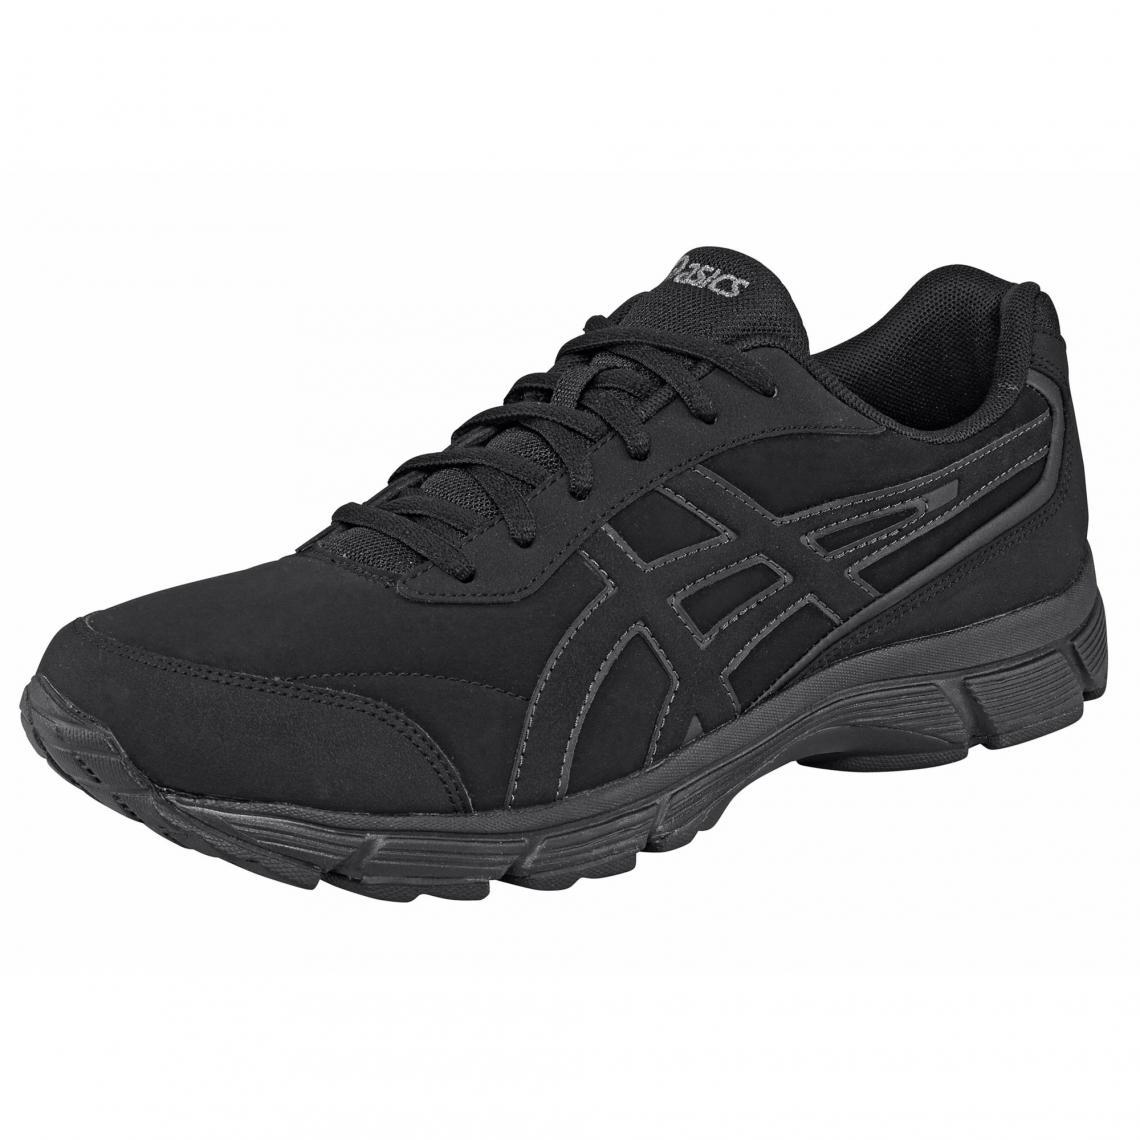 Chaussures de Running Asics Gel Mission | 3 SUISSES